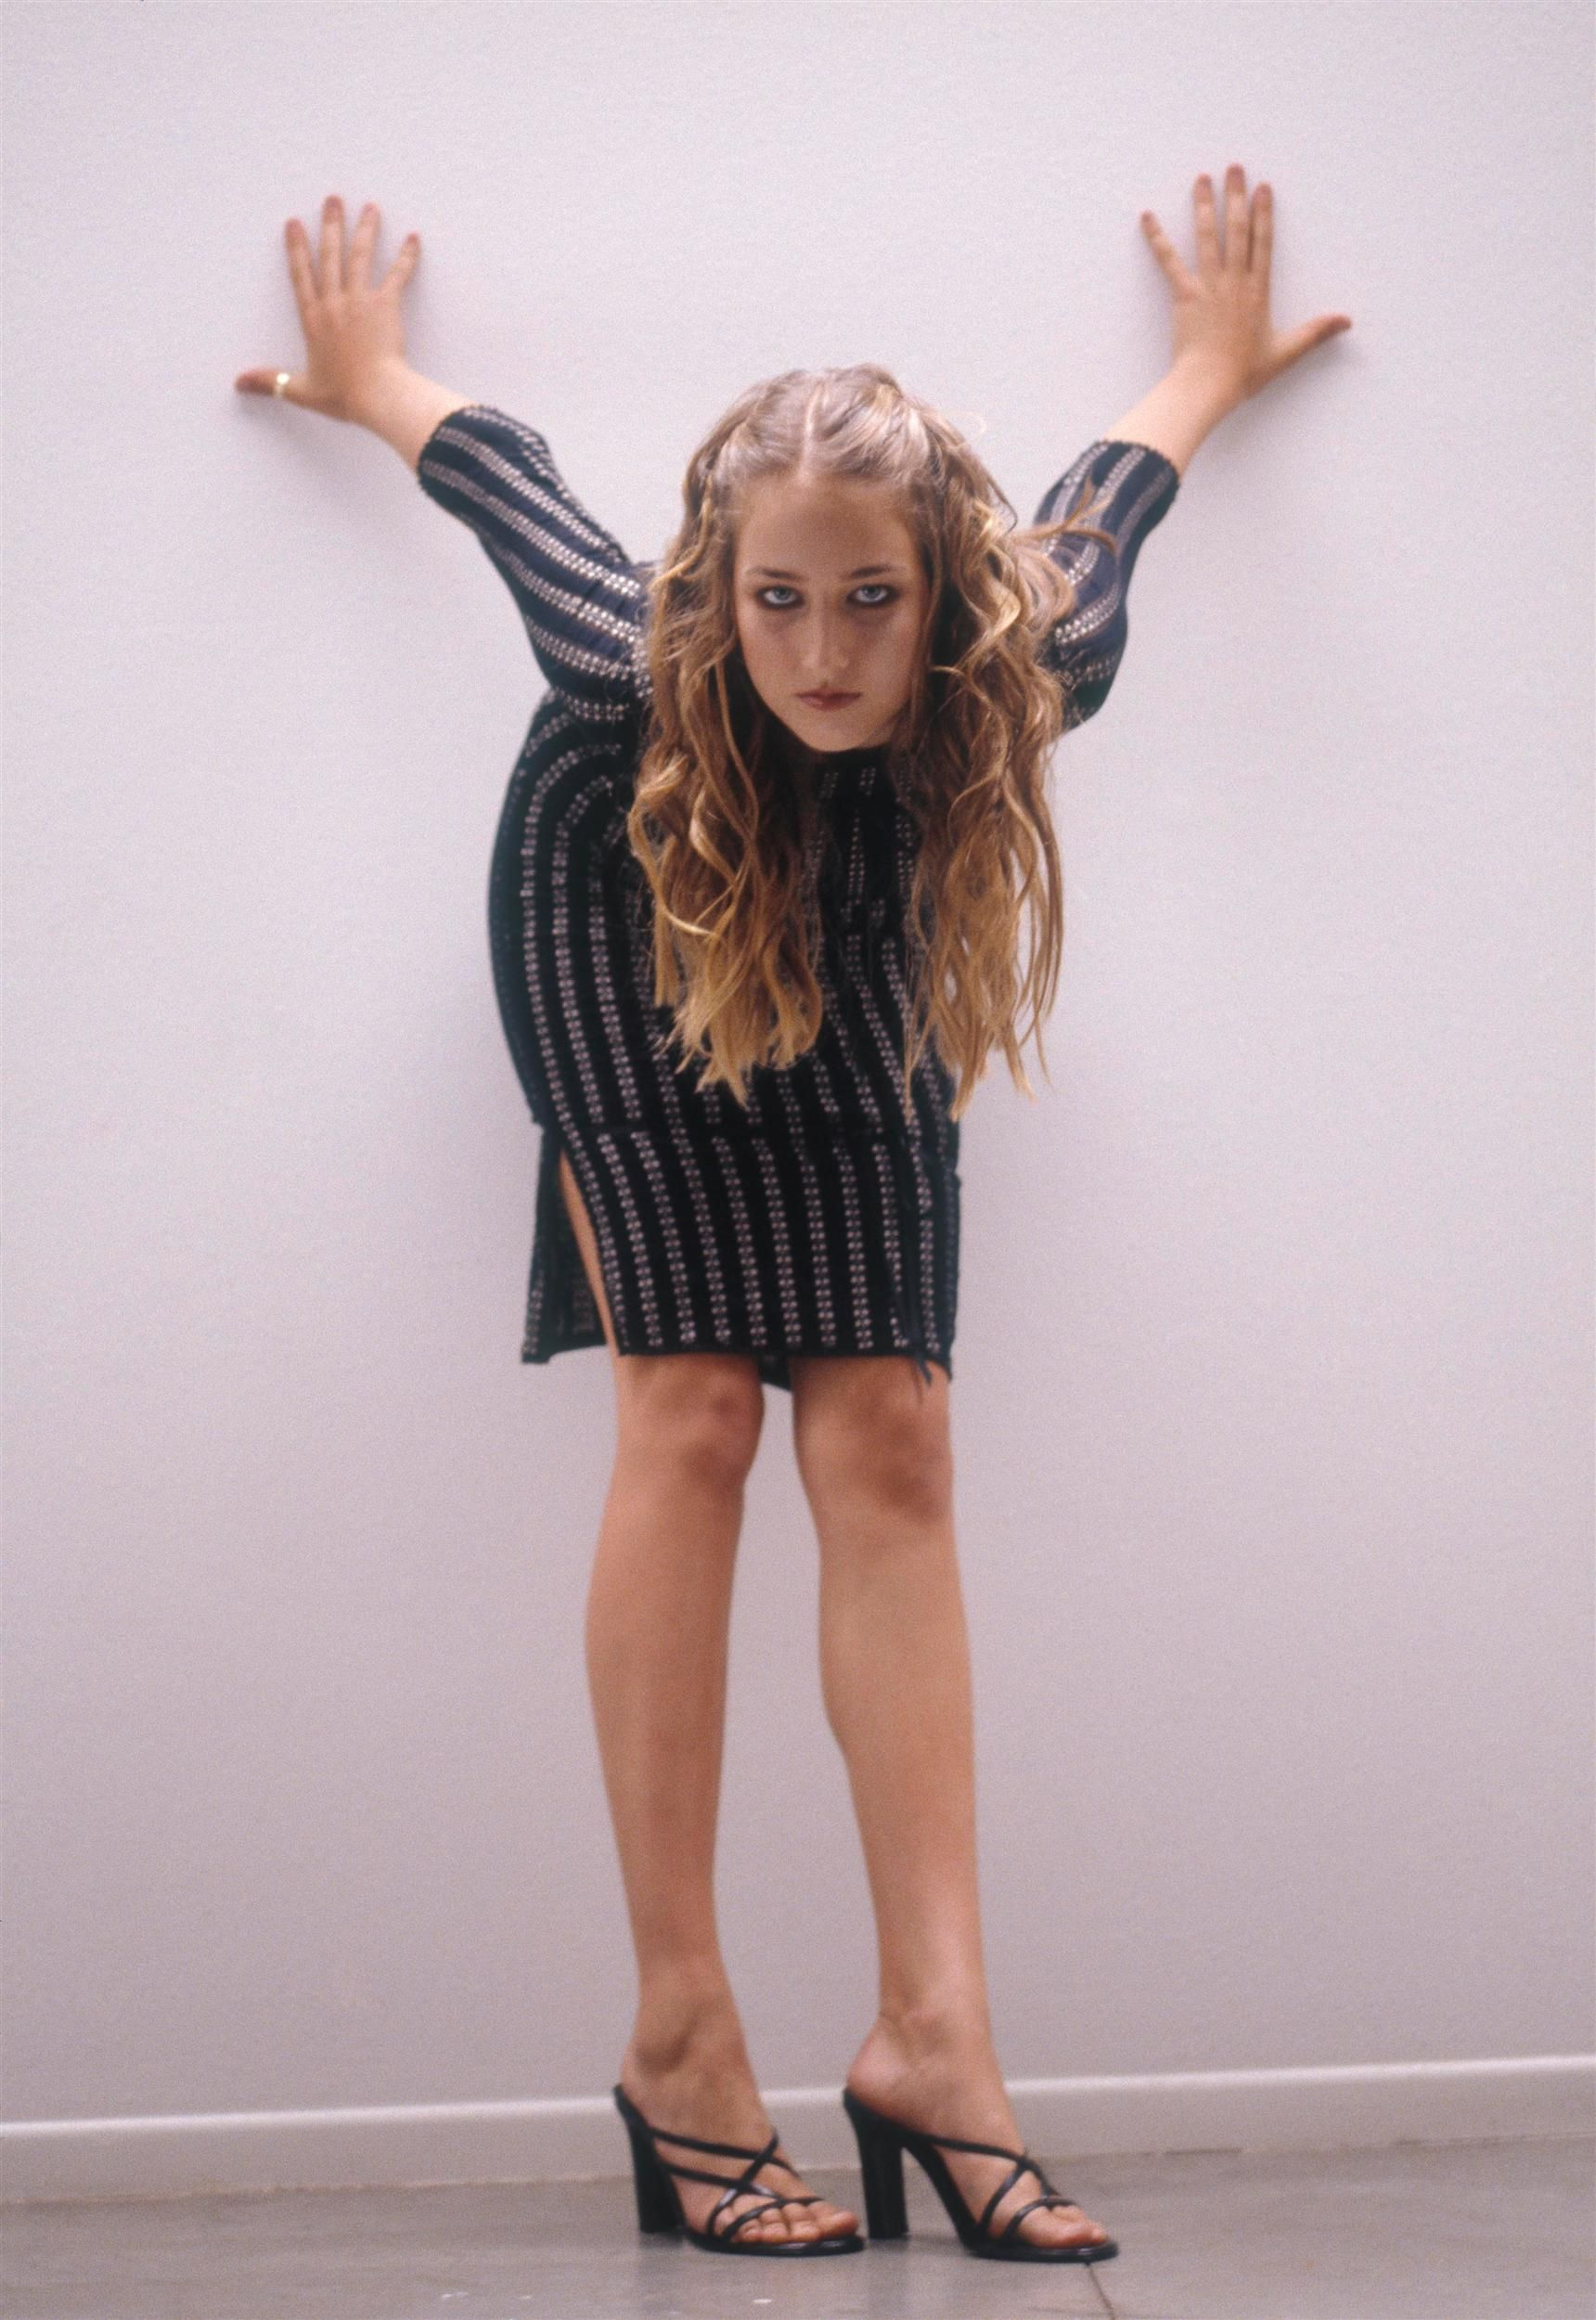 Feet Leelee Sobieski nude (86 photos), Ass, Bikini, Instagram, butt 2015